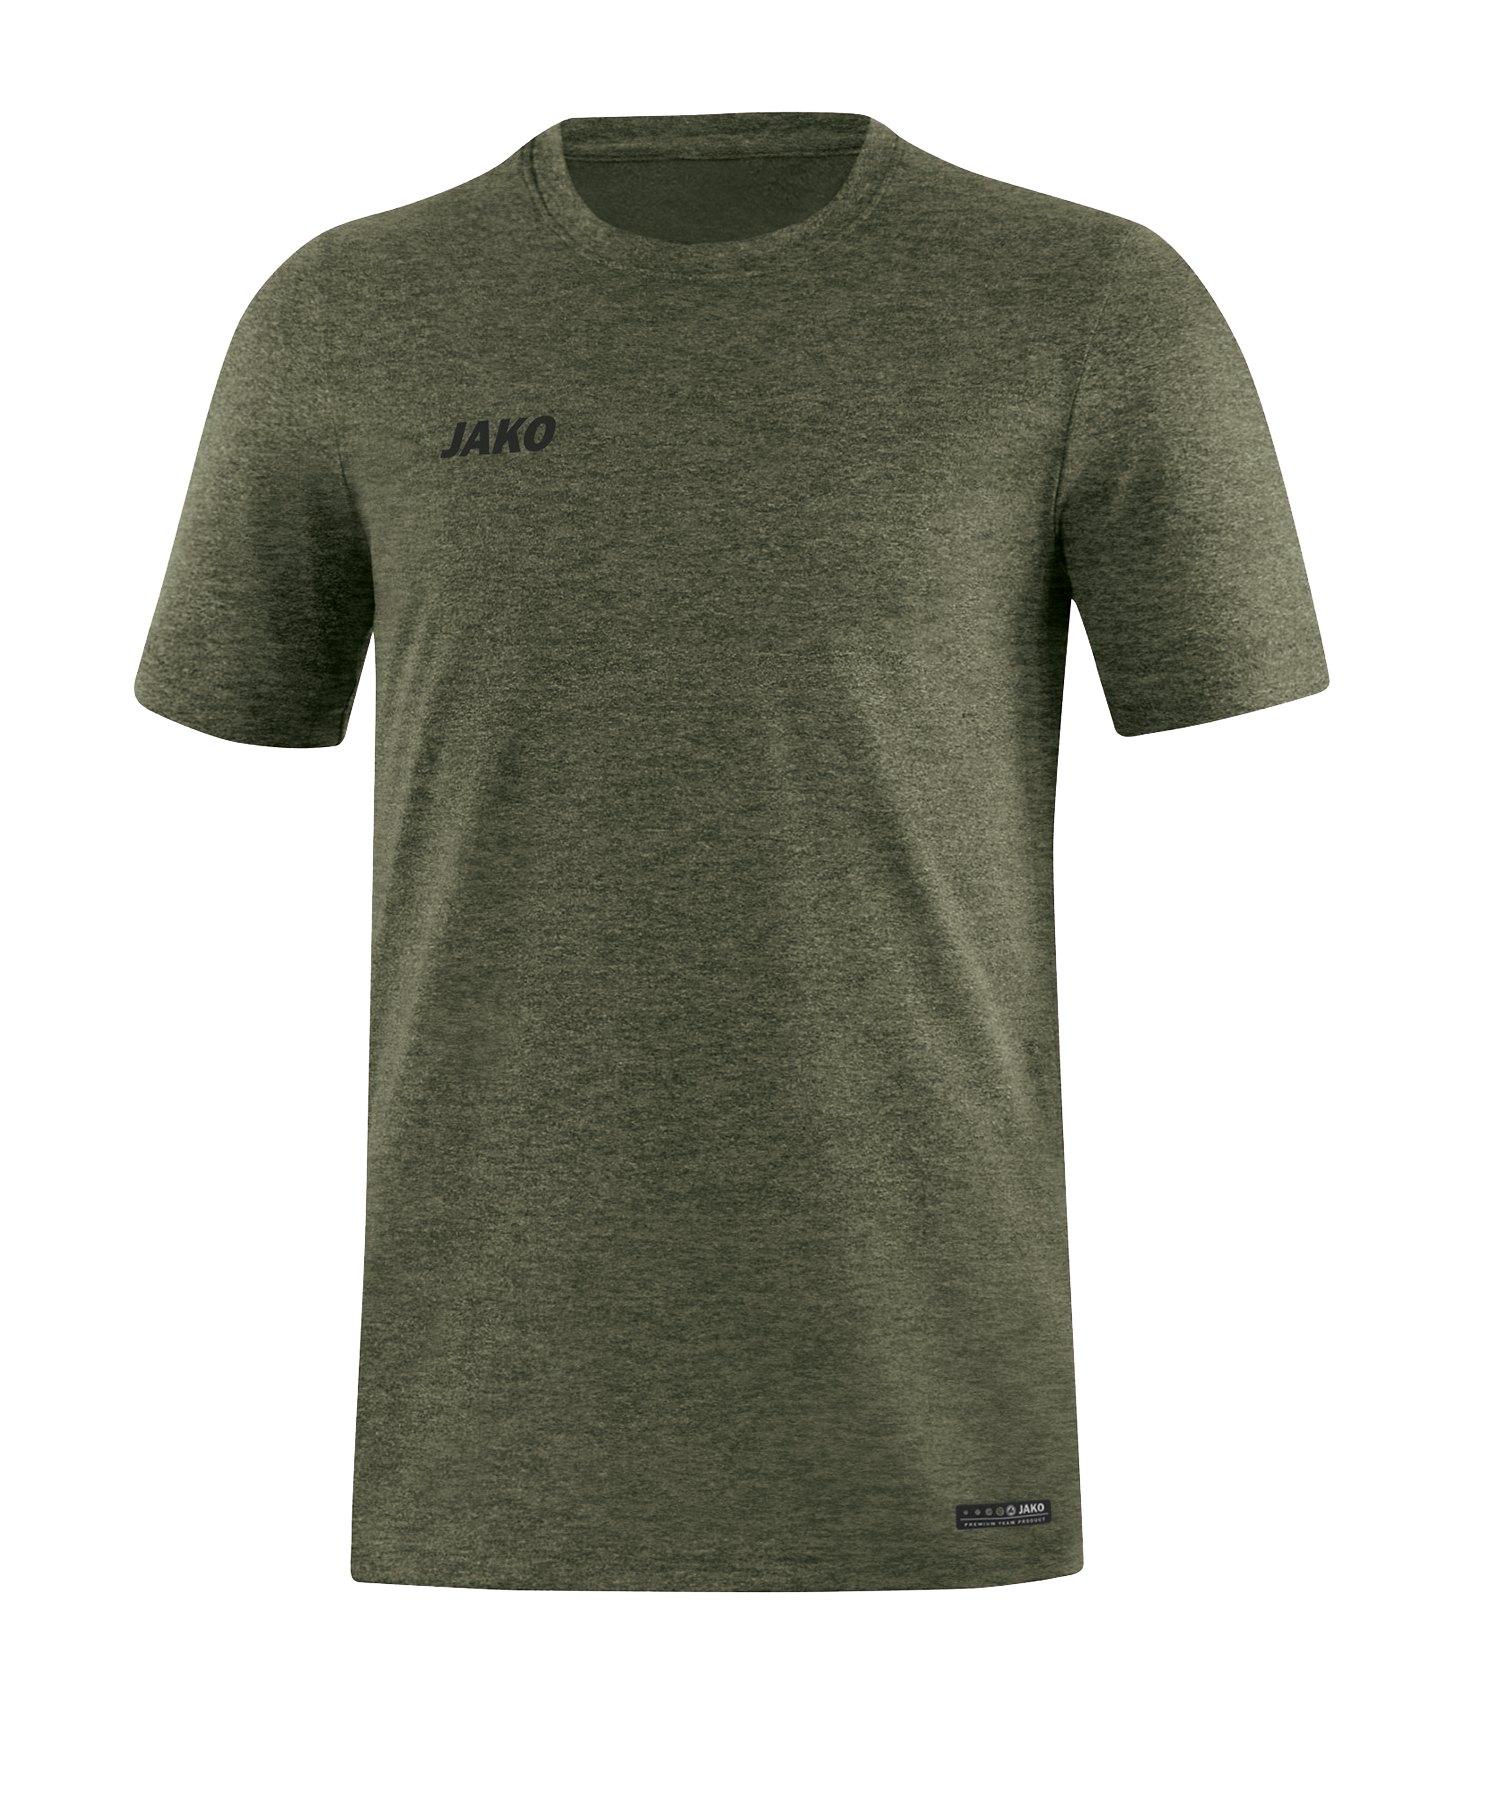 Jako T-Shirt Premium Basic Khaki F28 - khaki